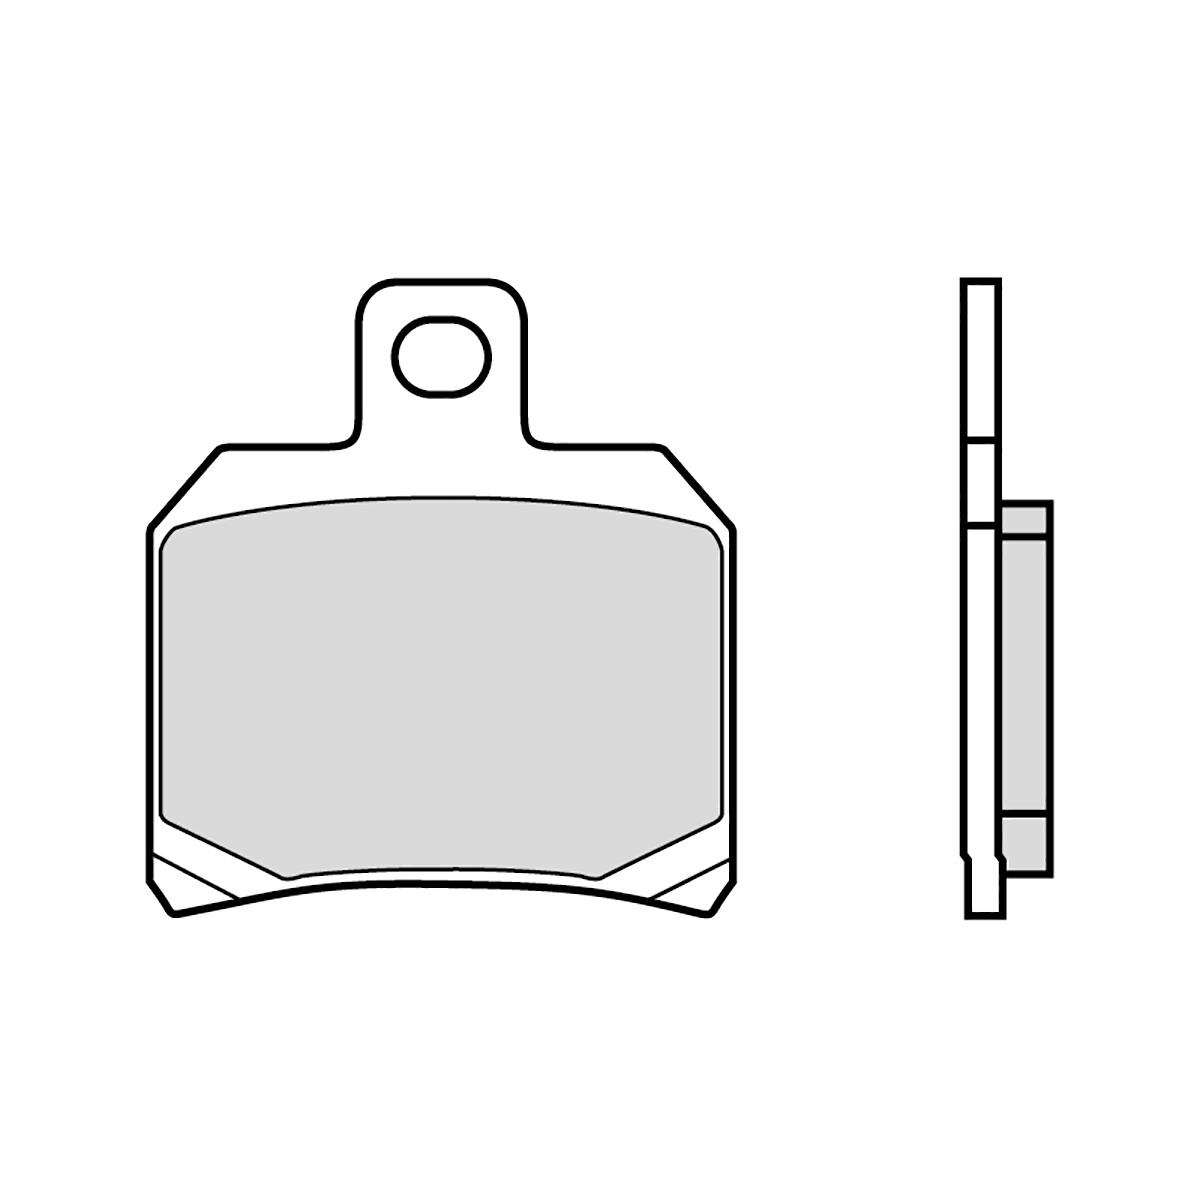 07BB20CC Pastillas Brembo Freno Posterior 07BB20CC para Ktm SUPER DUKE R 1290 2014 > 2020